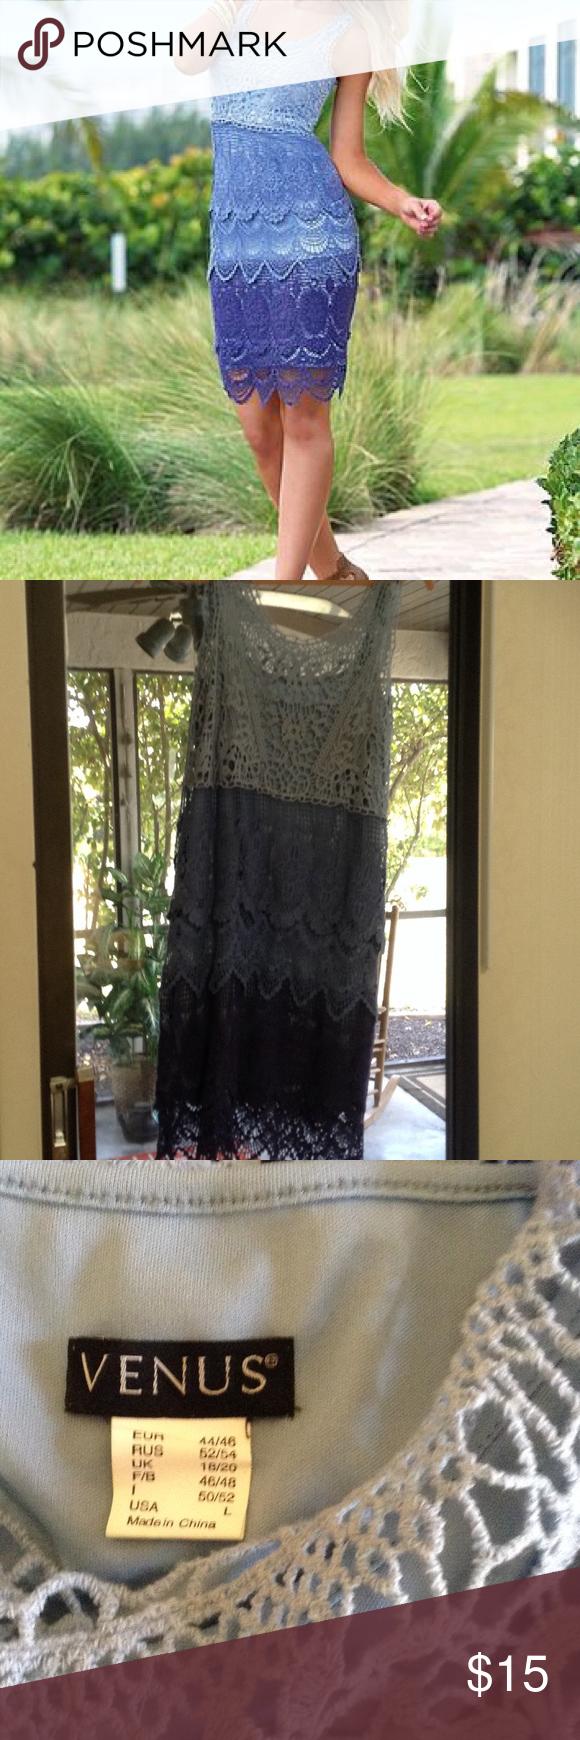 Venus crochet dress Shades of blue. Has a separate blue slip lining VENUS Dresses Mini